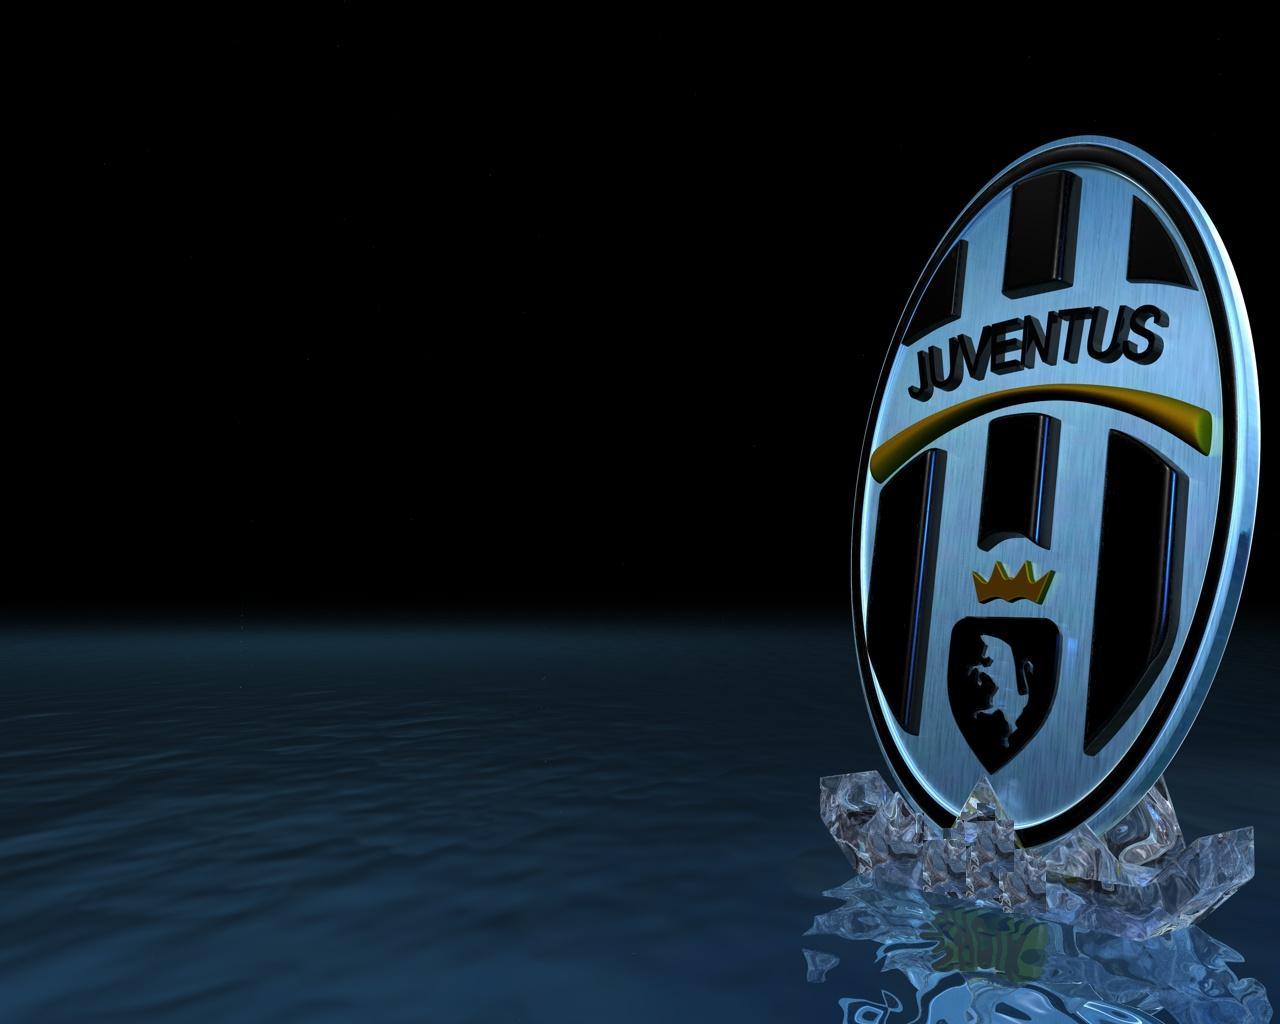 Free Download Juventus Fc Hq Wallpapers For Desktop